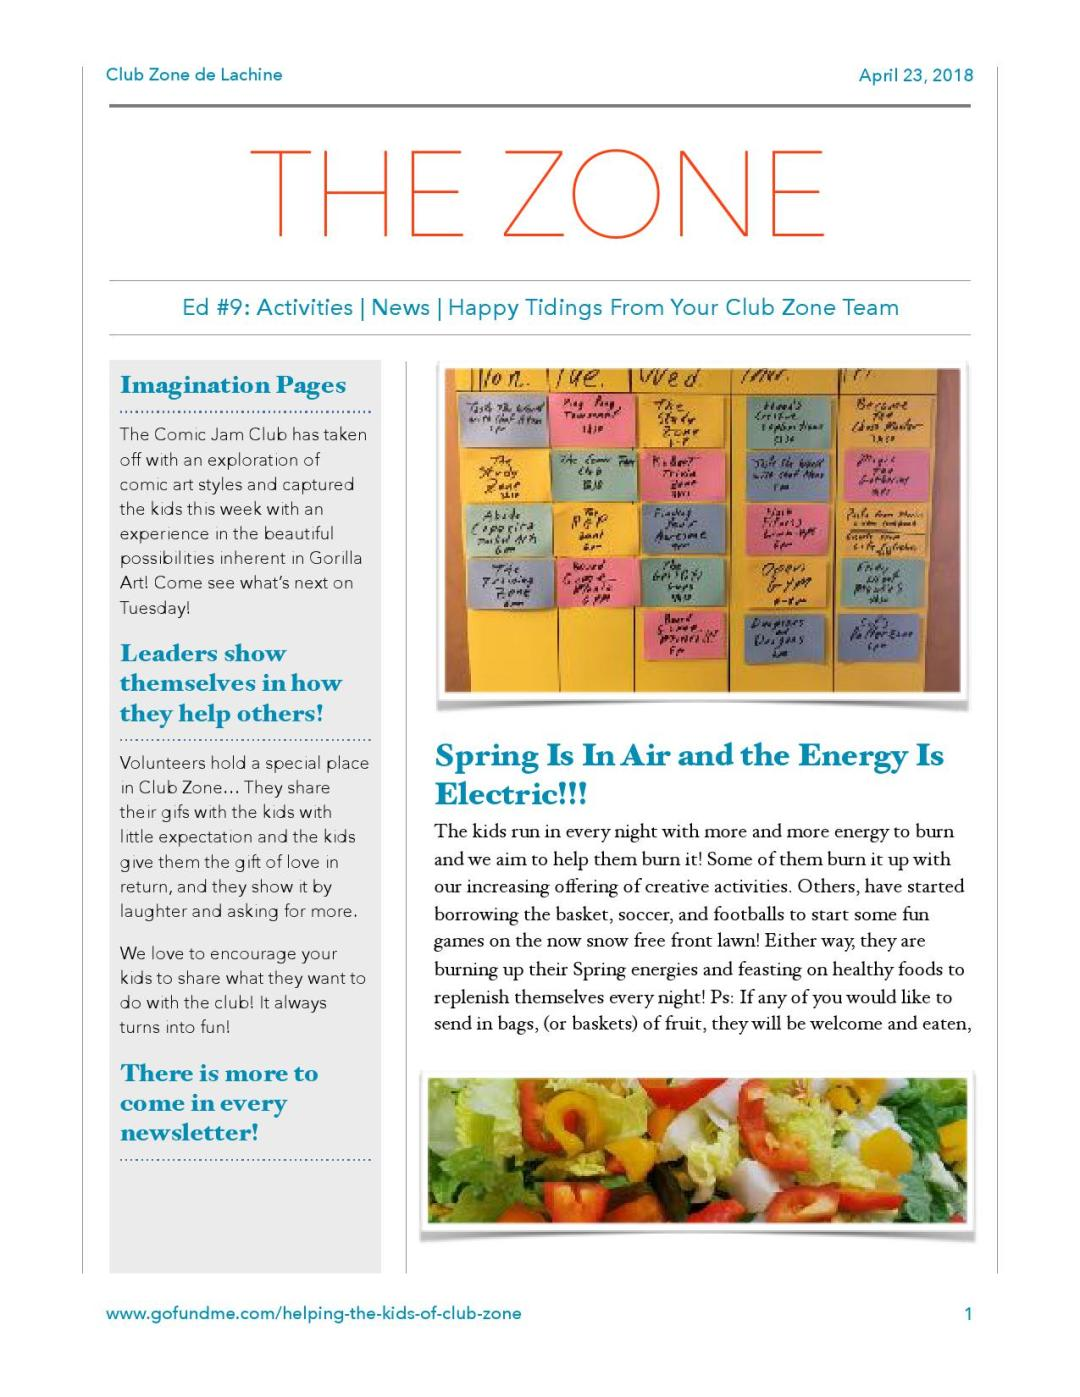 Club Zone Newsletter 2018-04-23_1